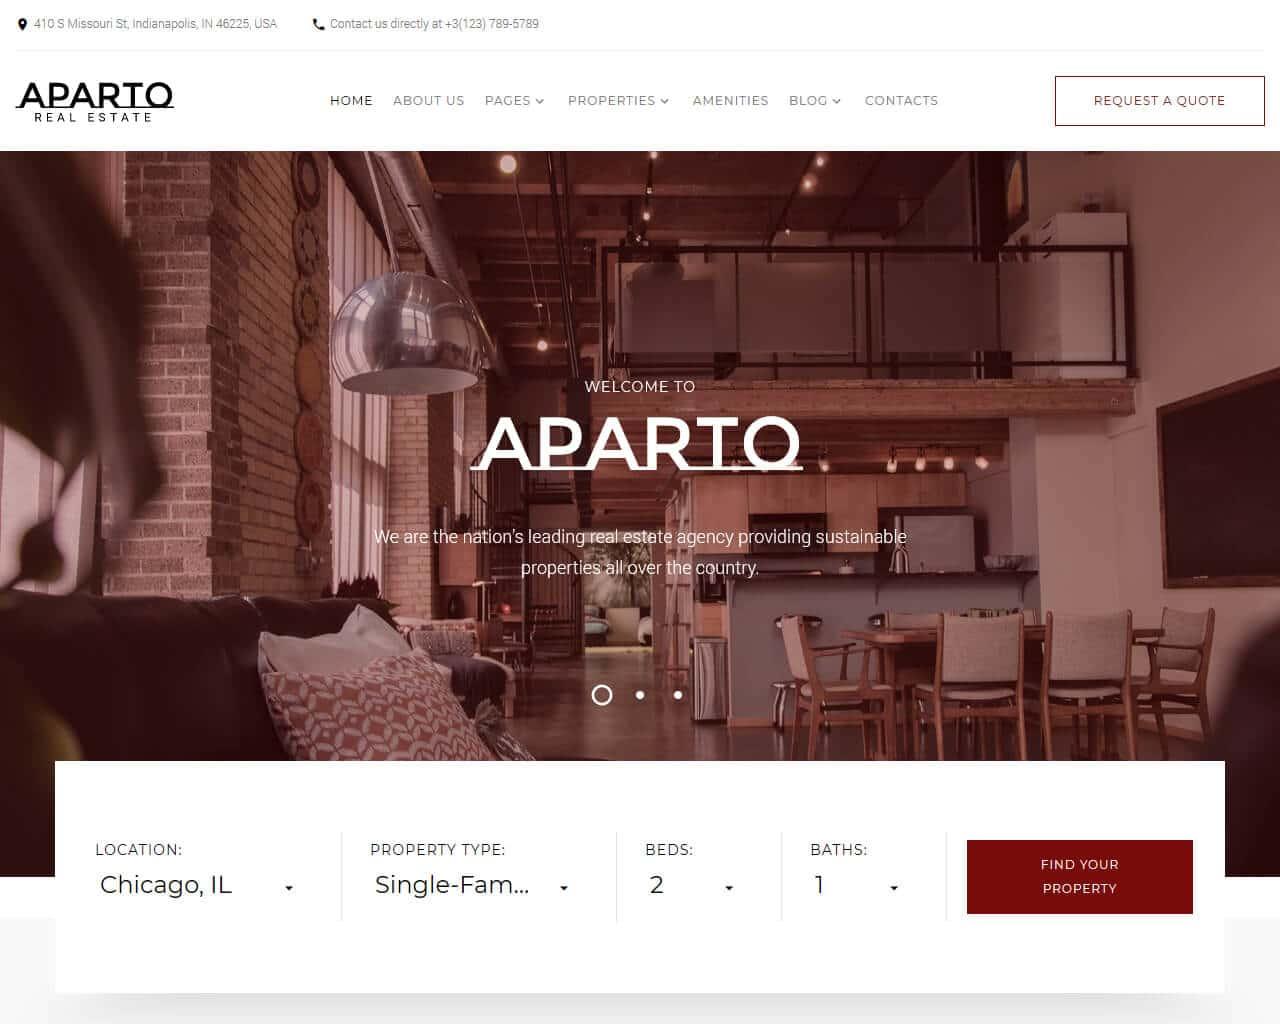 Aparto Website Template